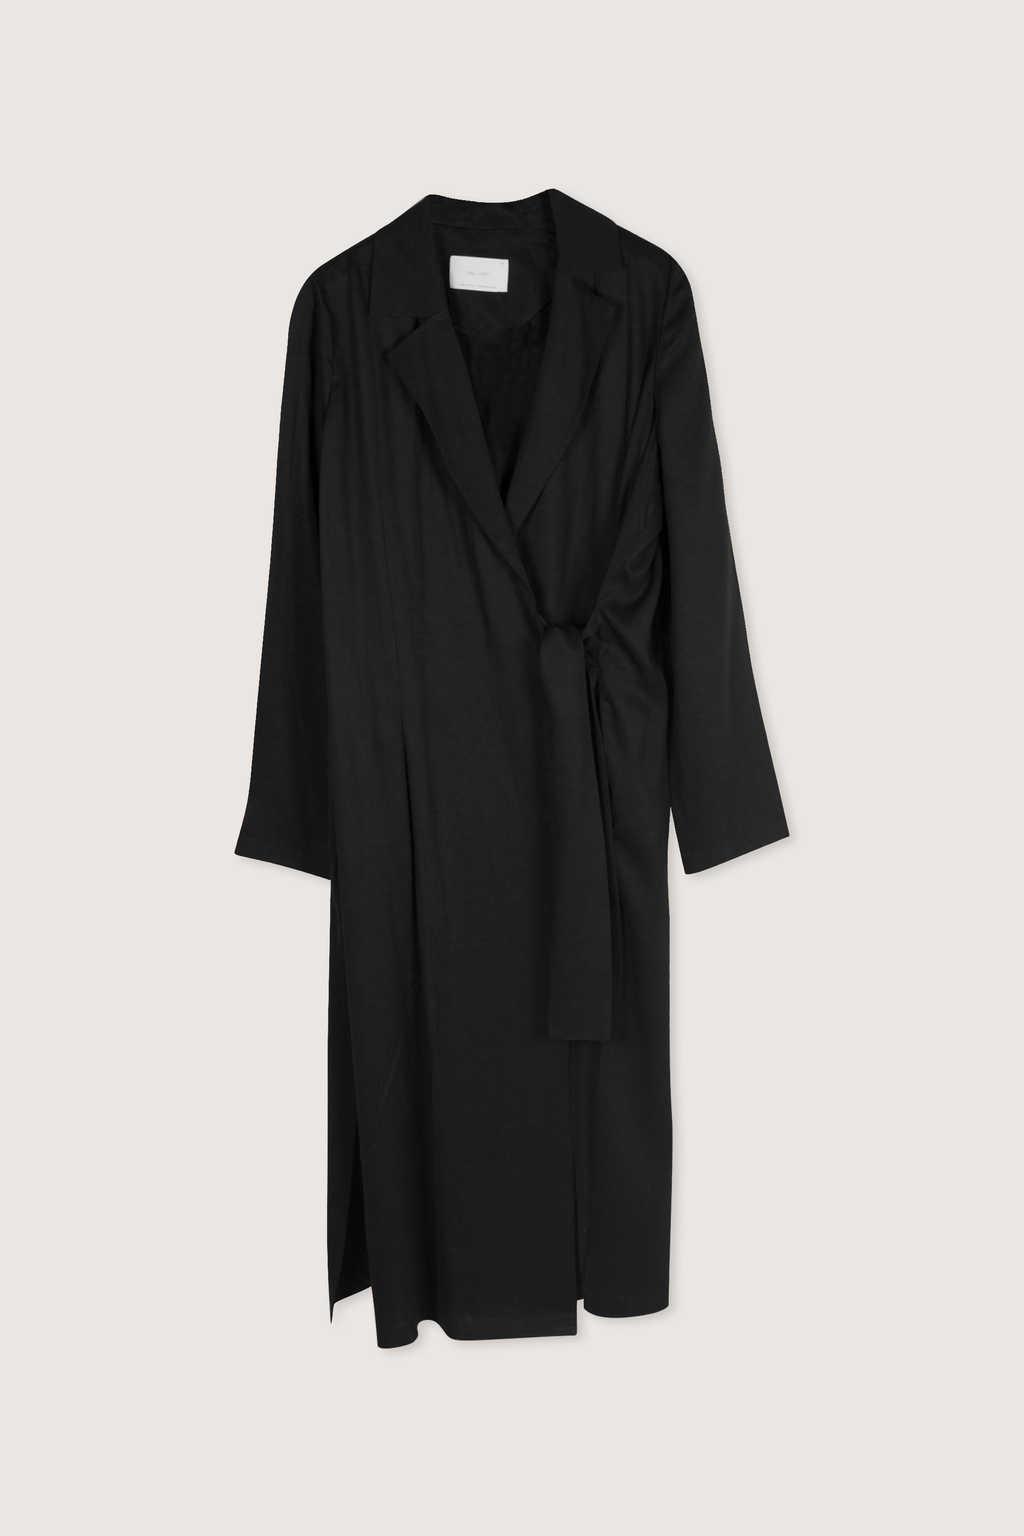 Jacket 2095 Black 9